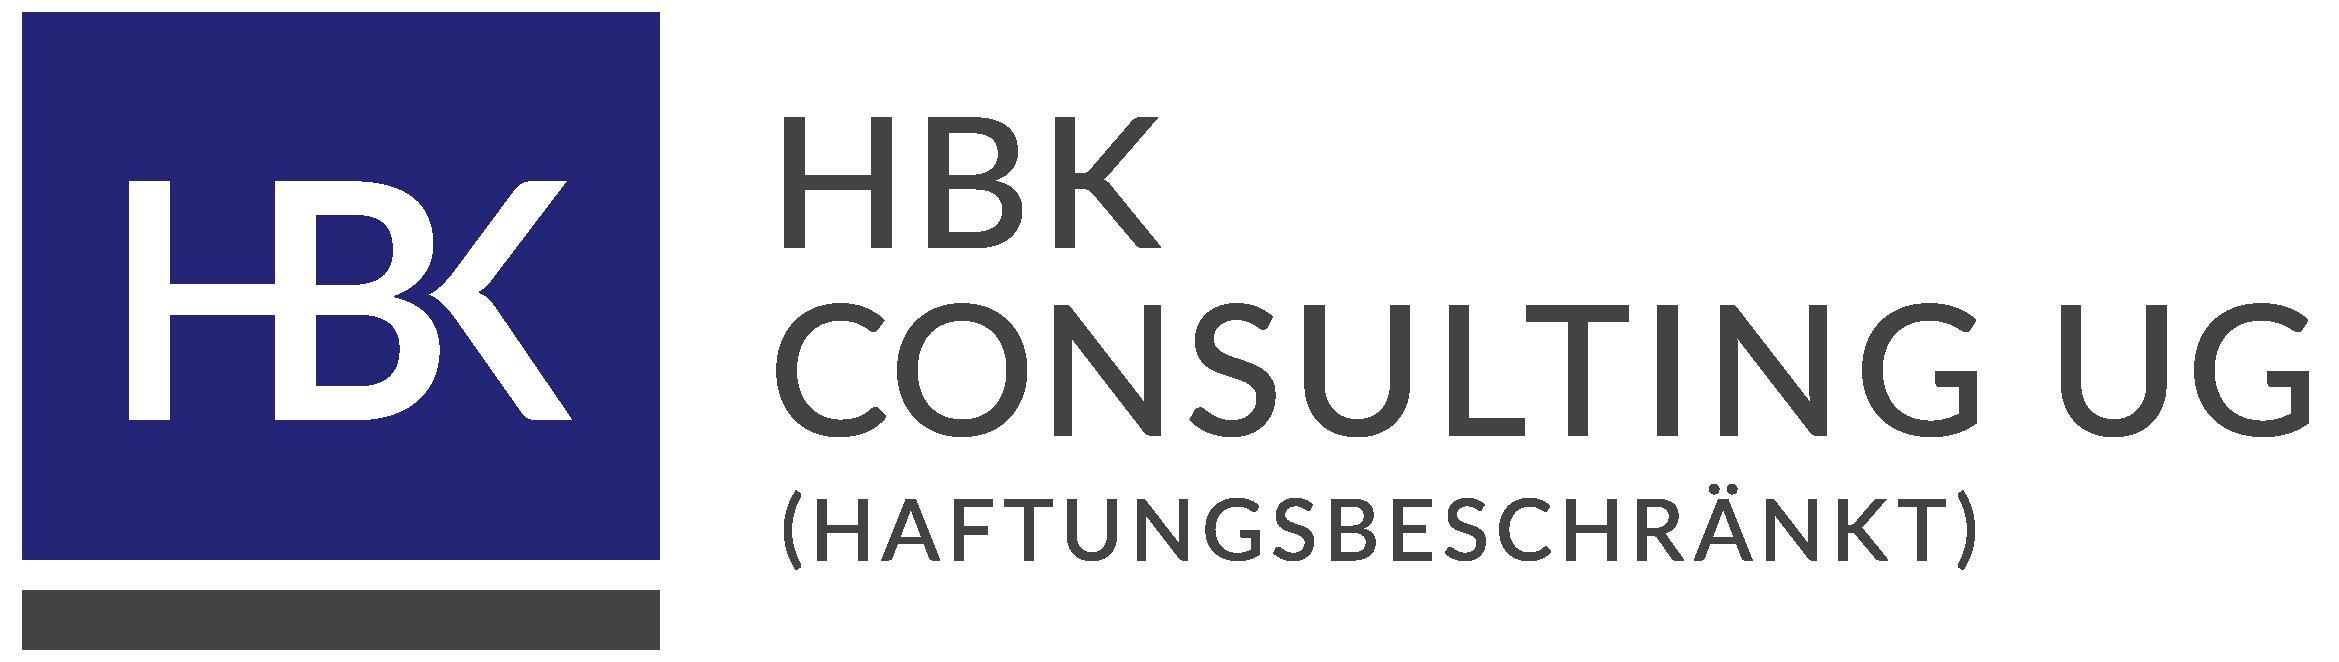 HBK Consulting